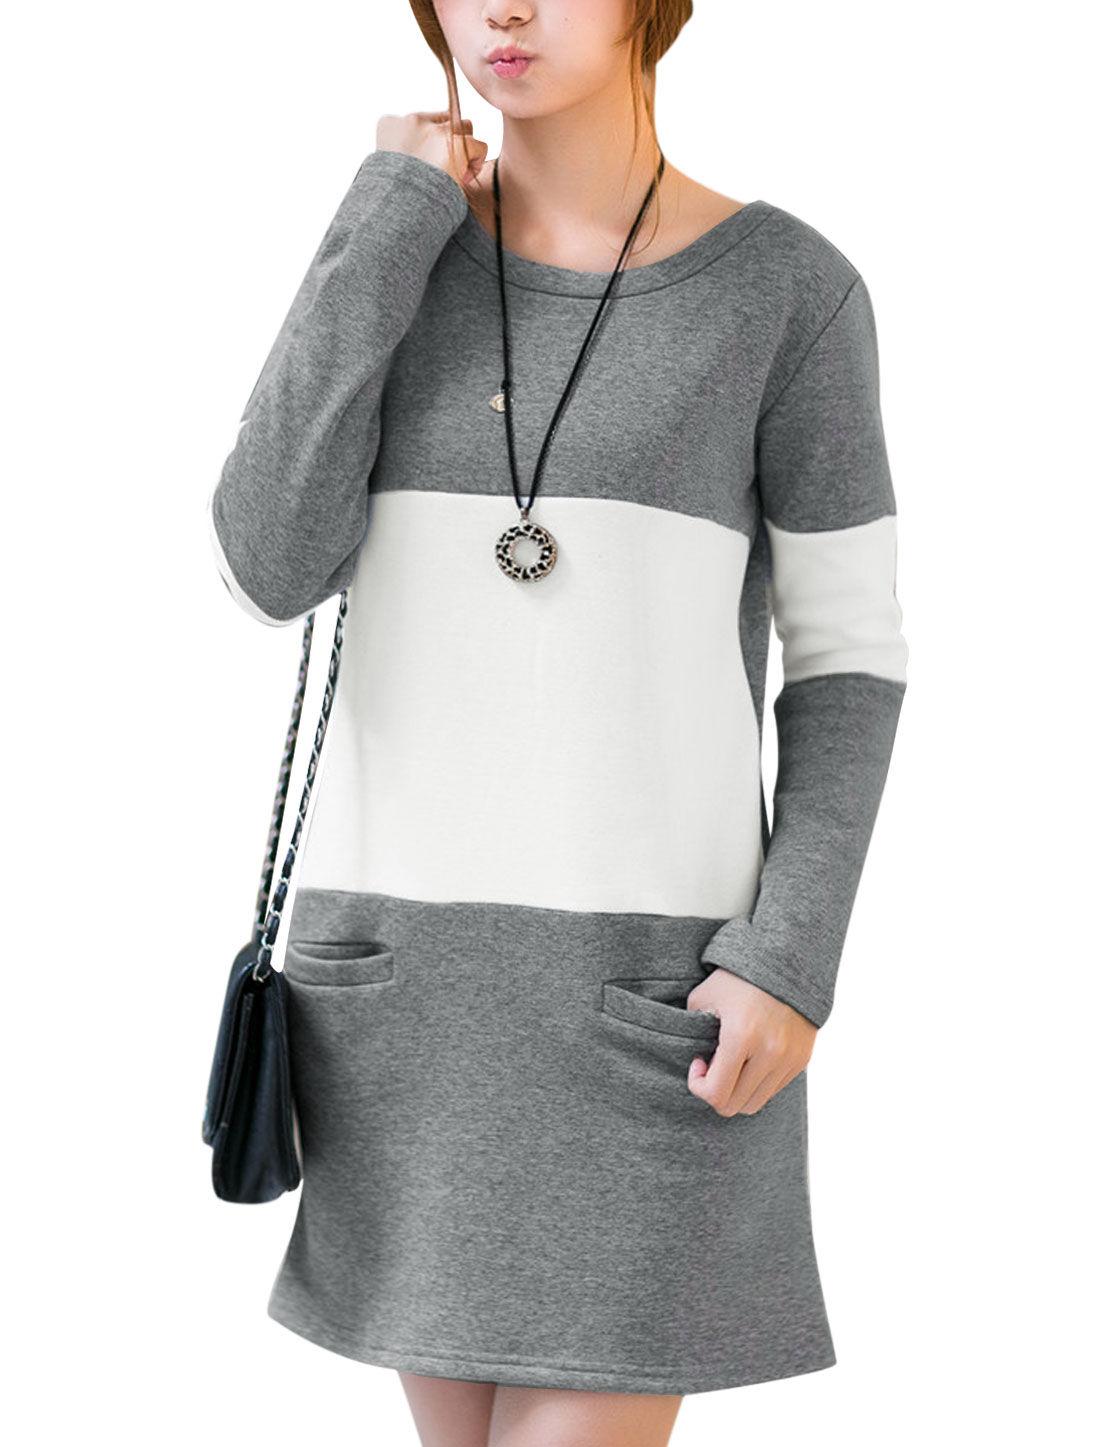 Lady Long Sleeve Contrast Color Fleece Inside Soft Dress White Gray S